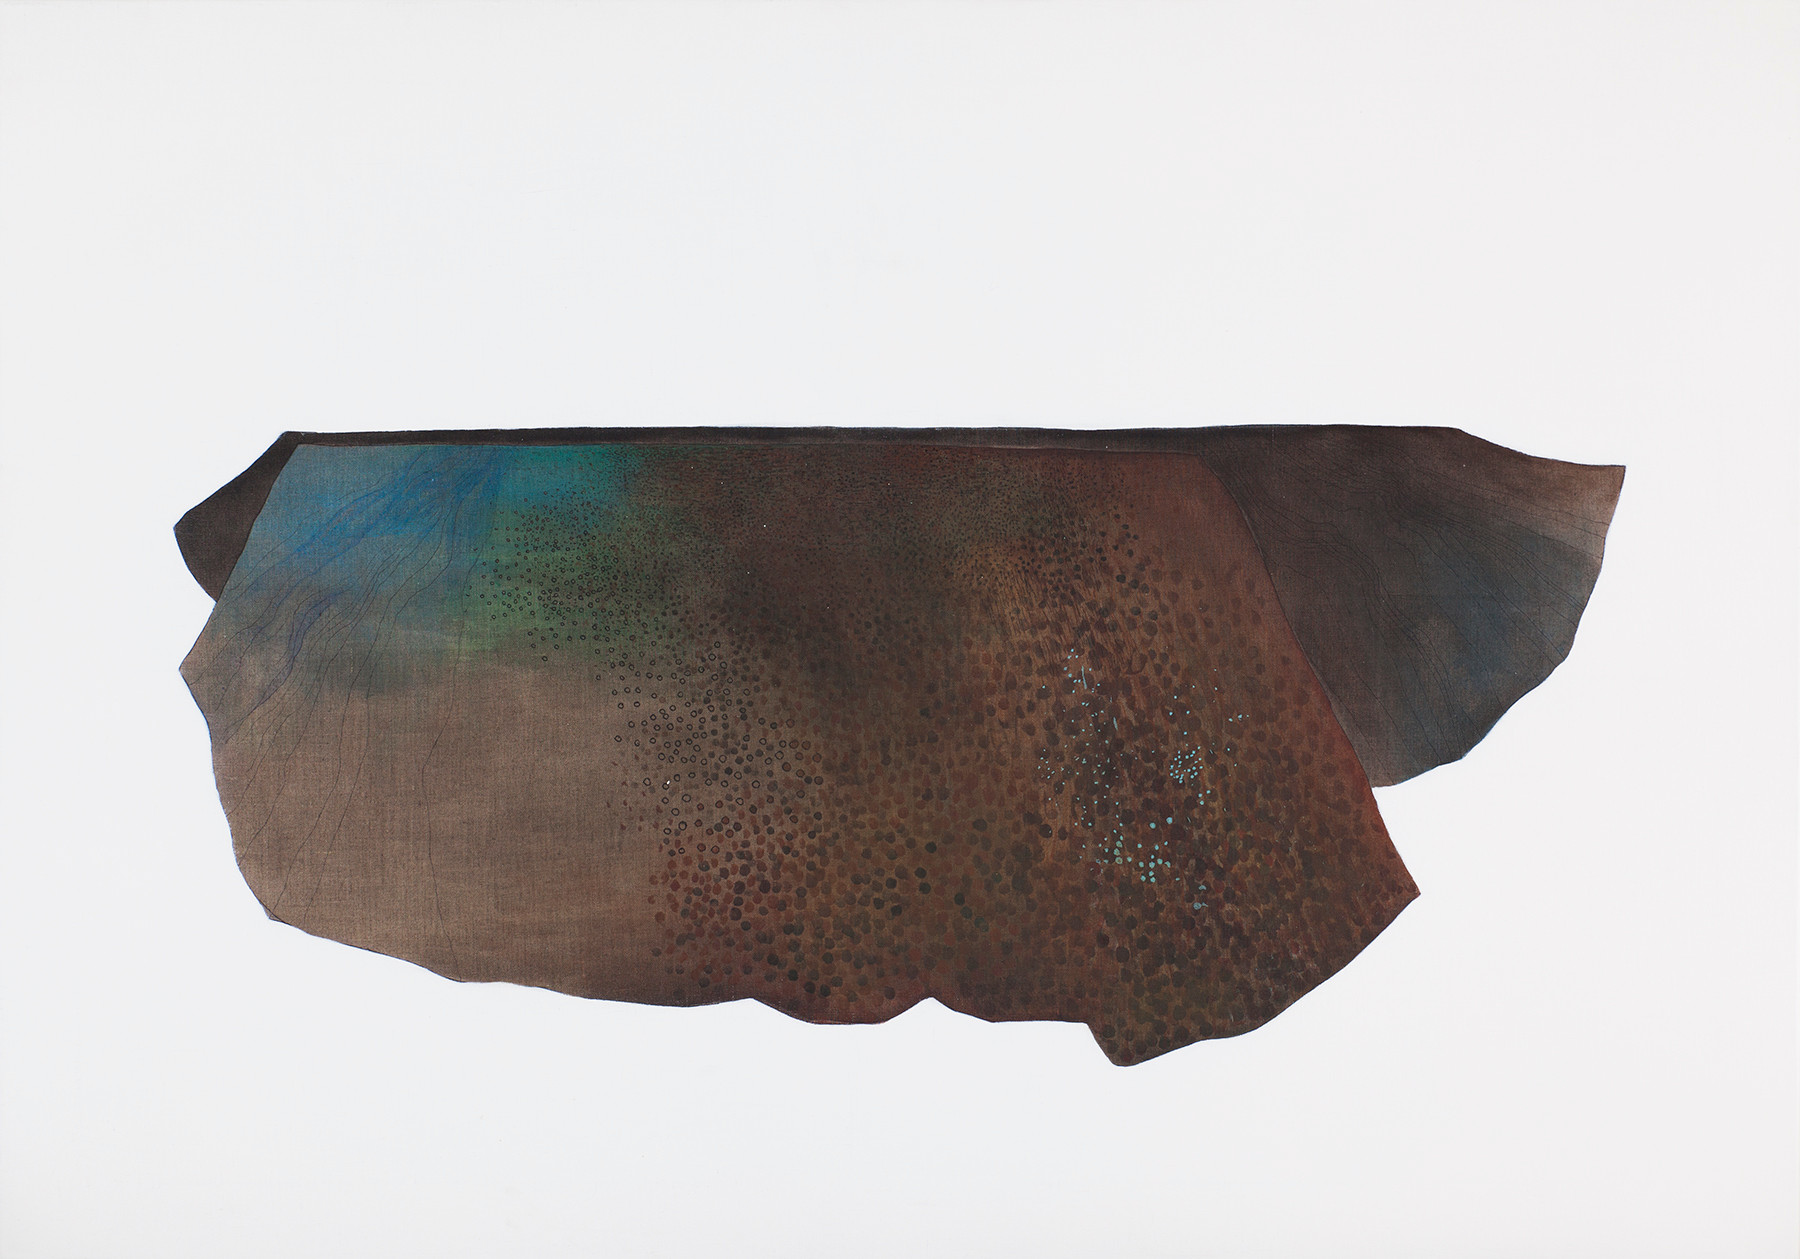 knollenveld nr. unknown, 95 x 135 cm